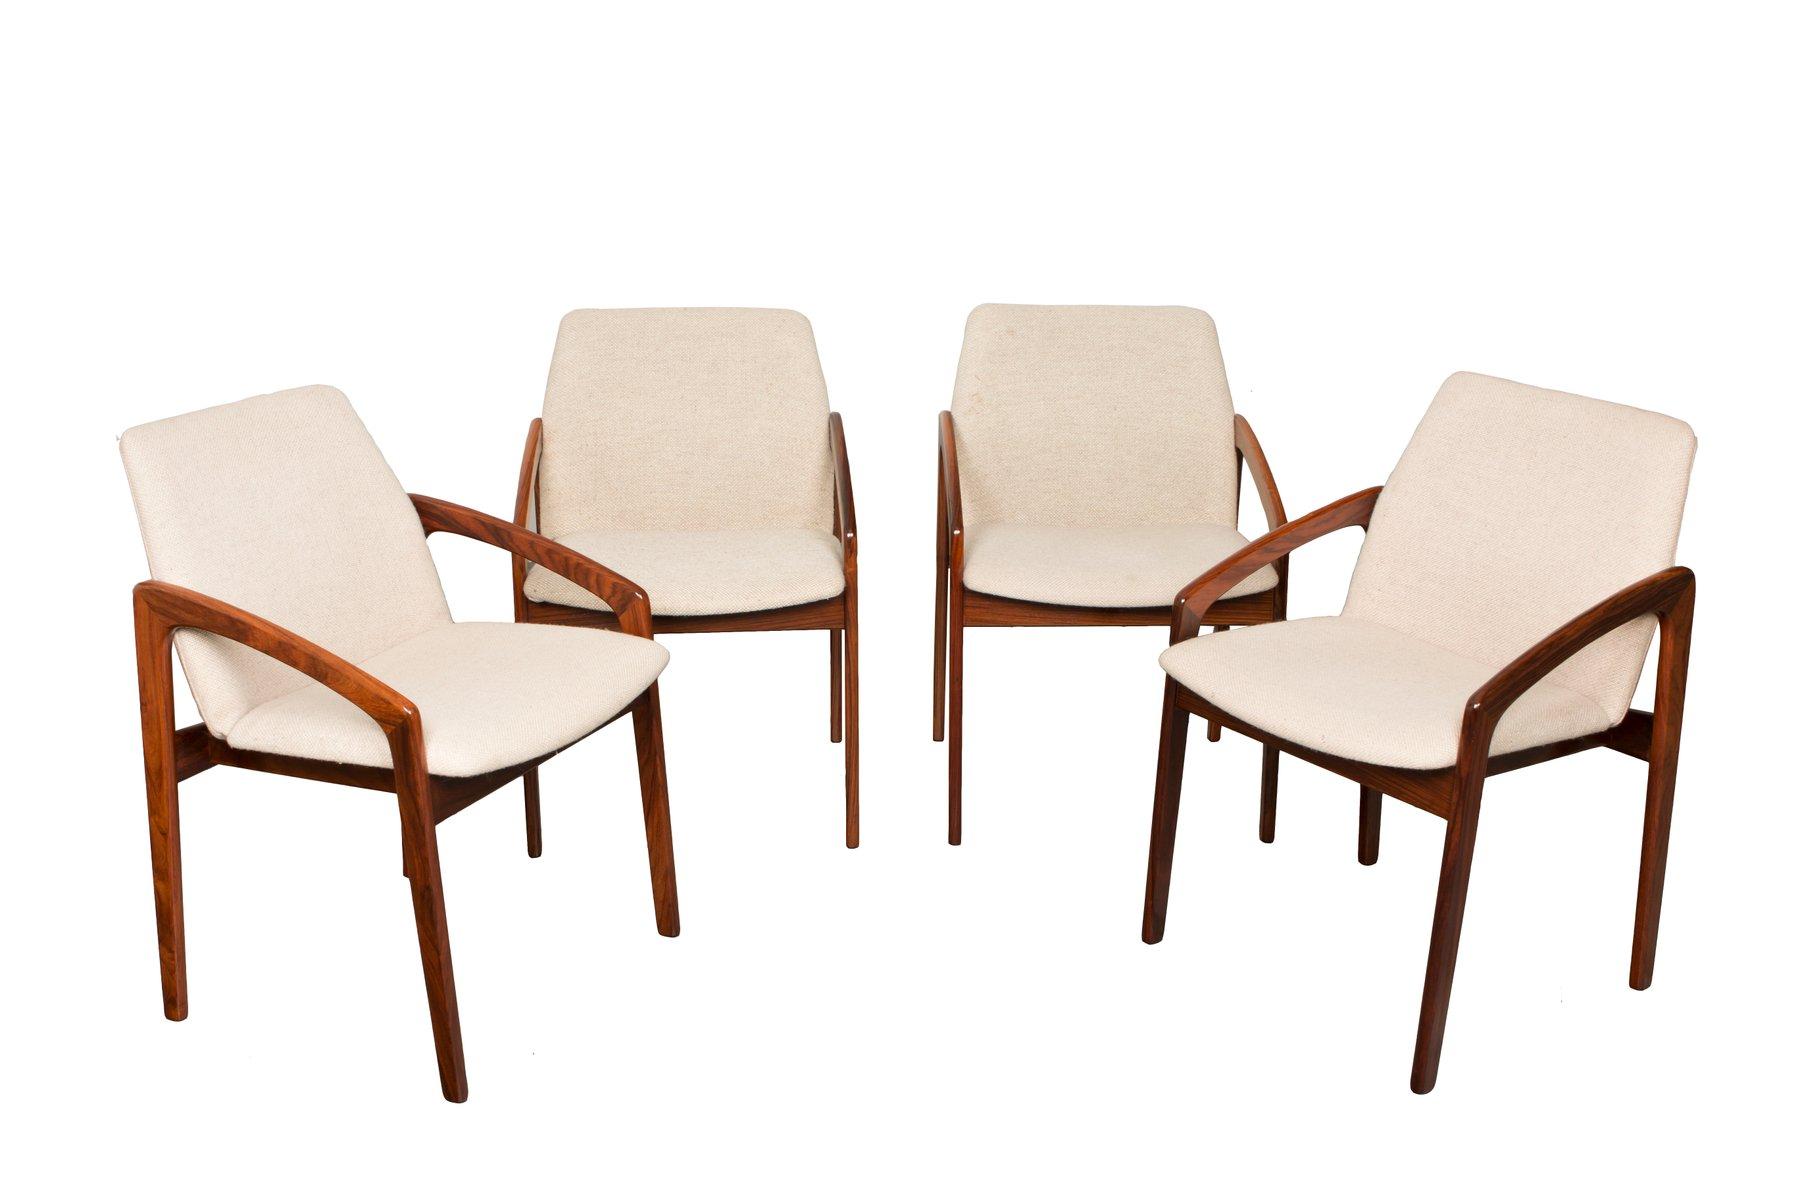 Rosewood dining chairs by kai kristiansen set of 10 for sale at pamono - Kai kristiansen chair ...